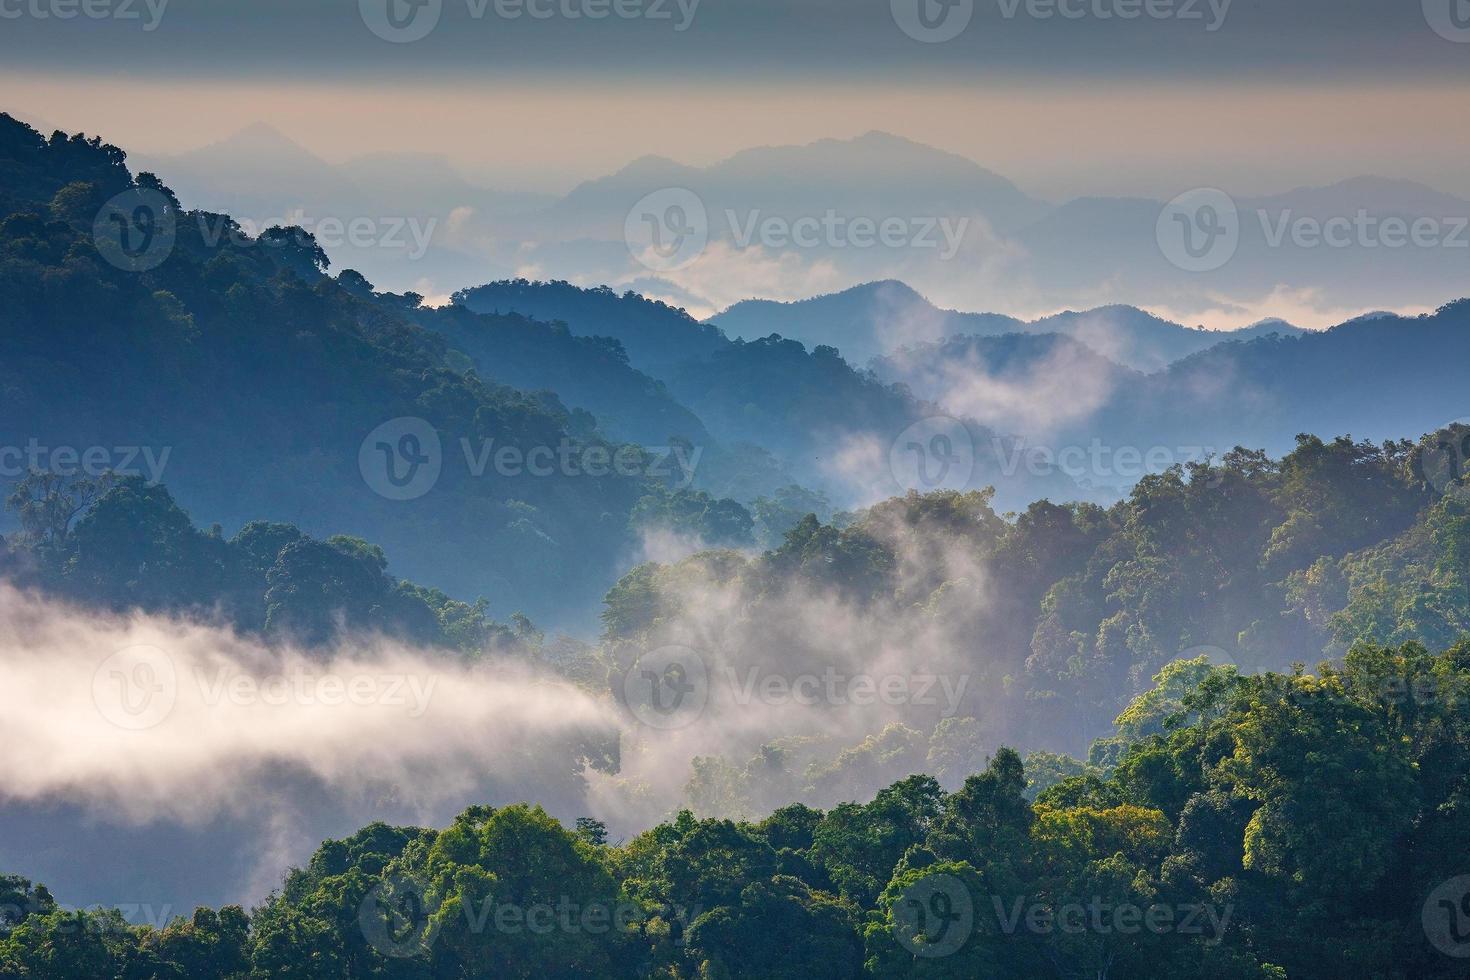 nebbia mattutina a catena montuosa tropicale, Thailandia foto